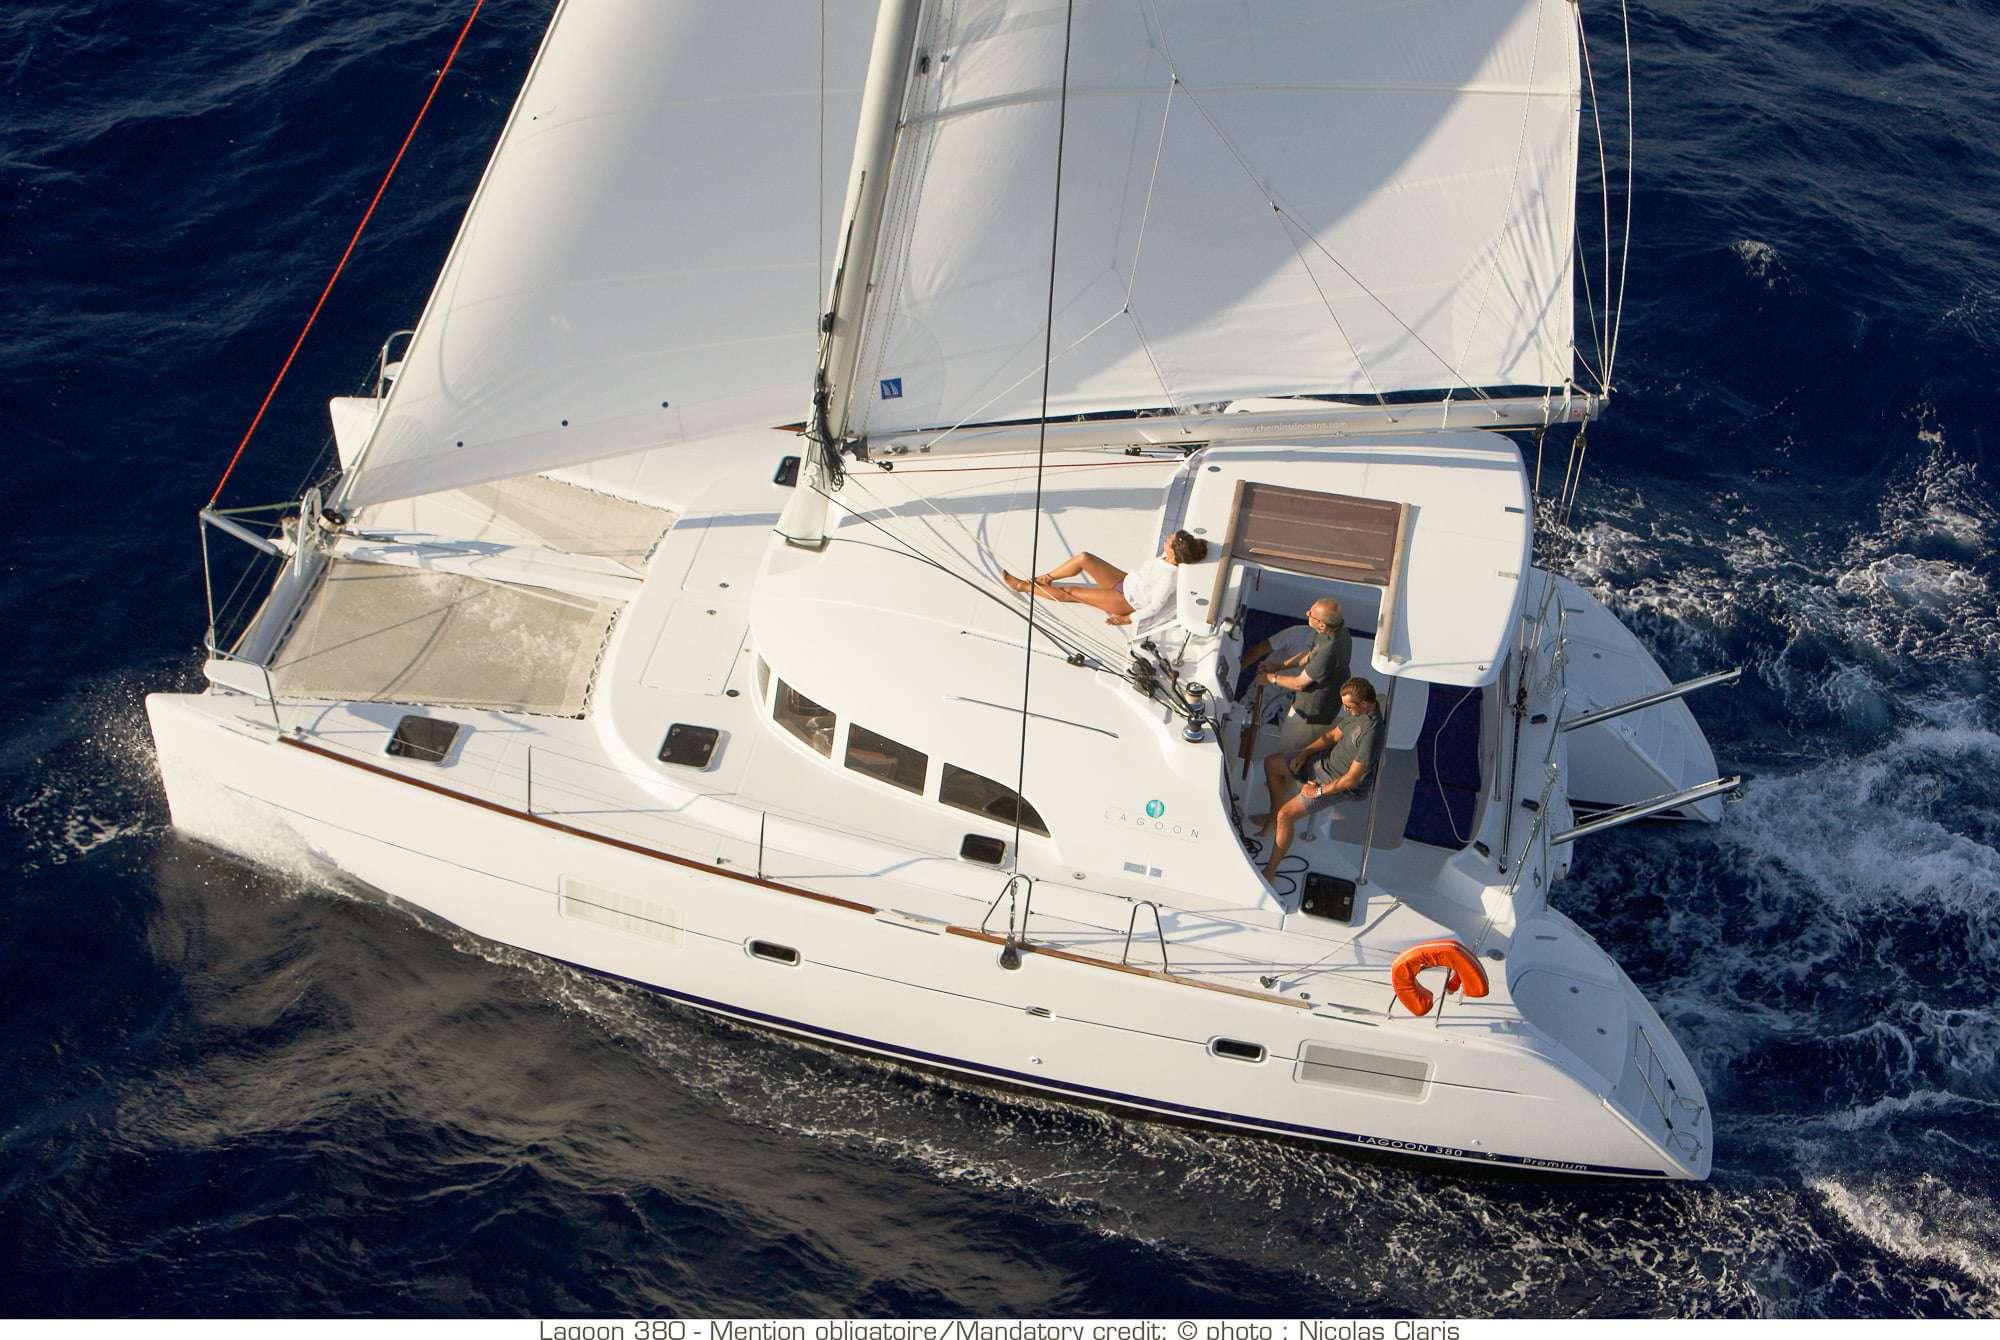 lagoon 380-yacht-charter-croatia-sailing-holidays-croatia-booking-yacht-charter-croatia-catamarans-sailboats-motorboats-gulets-luxury-yachts-boat-rental-croatia 5